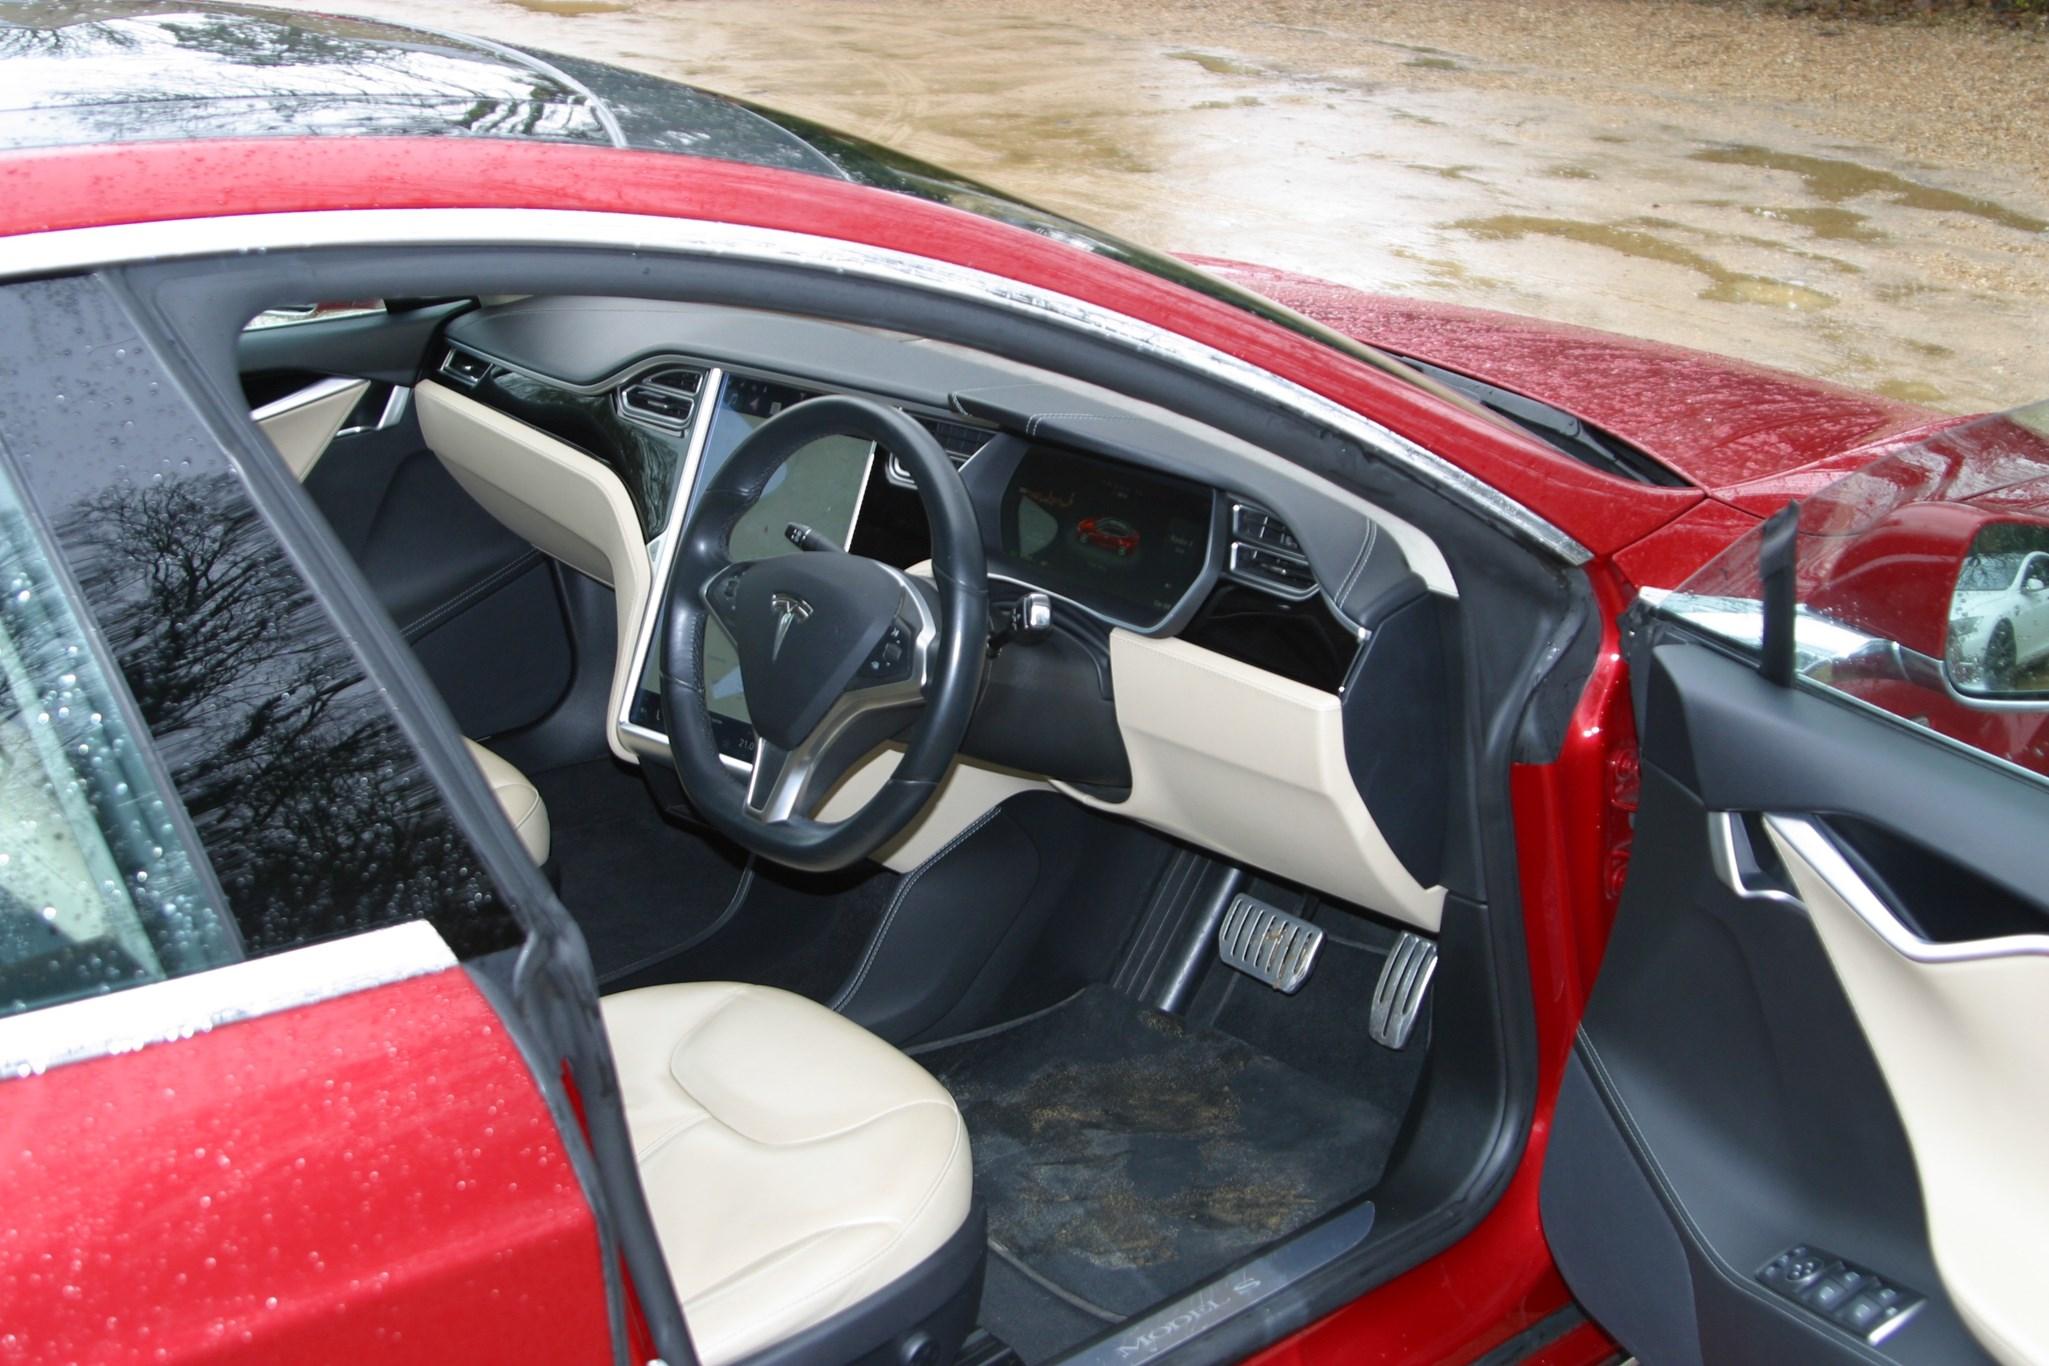 LHR heet Car Heater Car Windshield